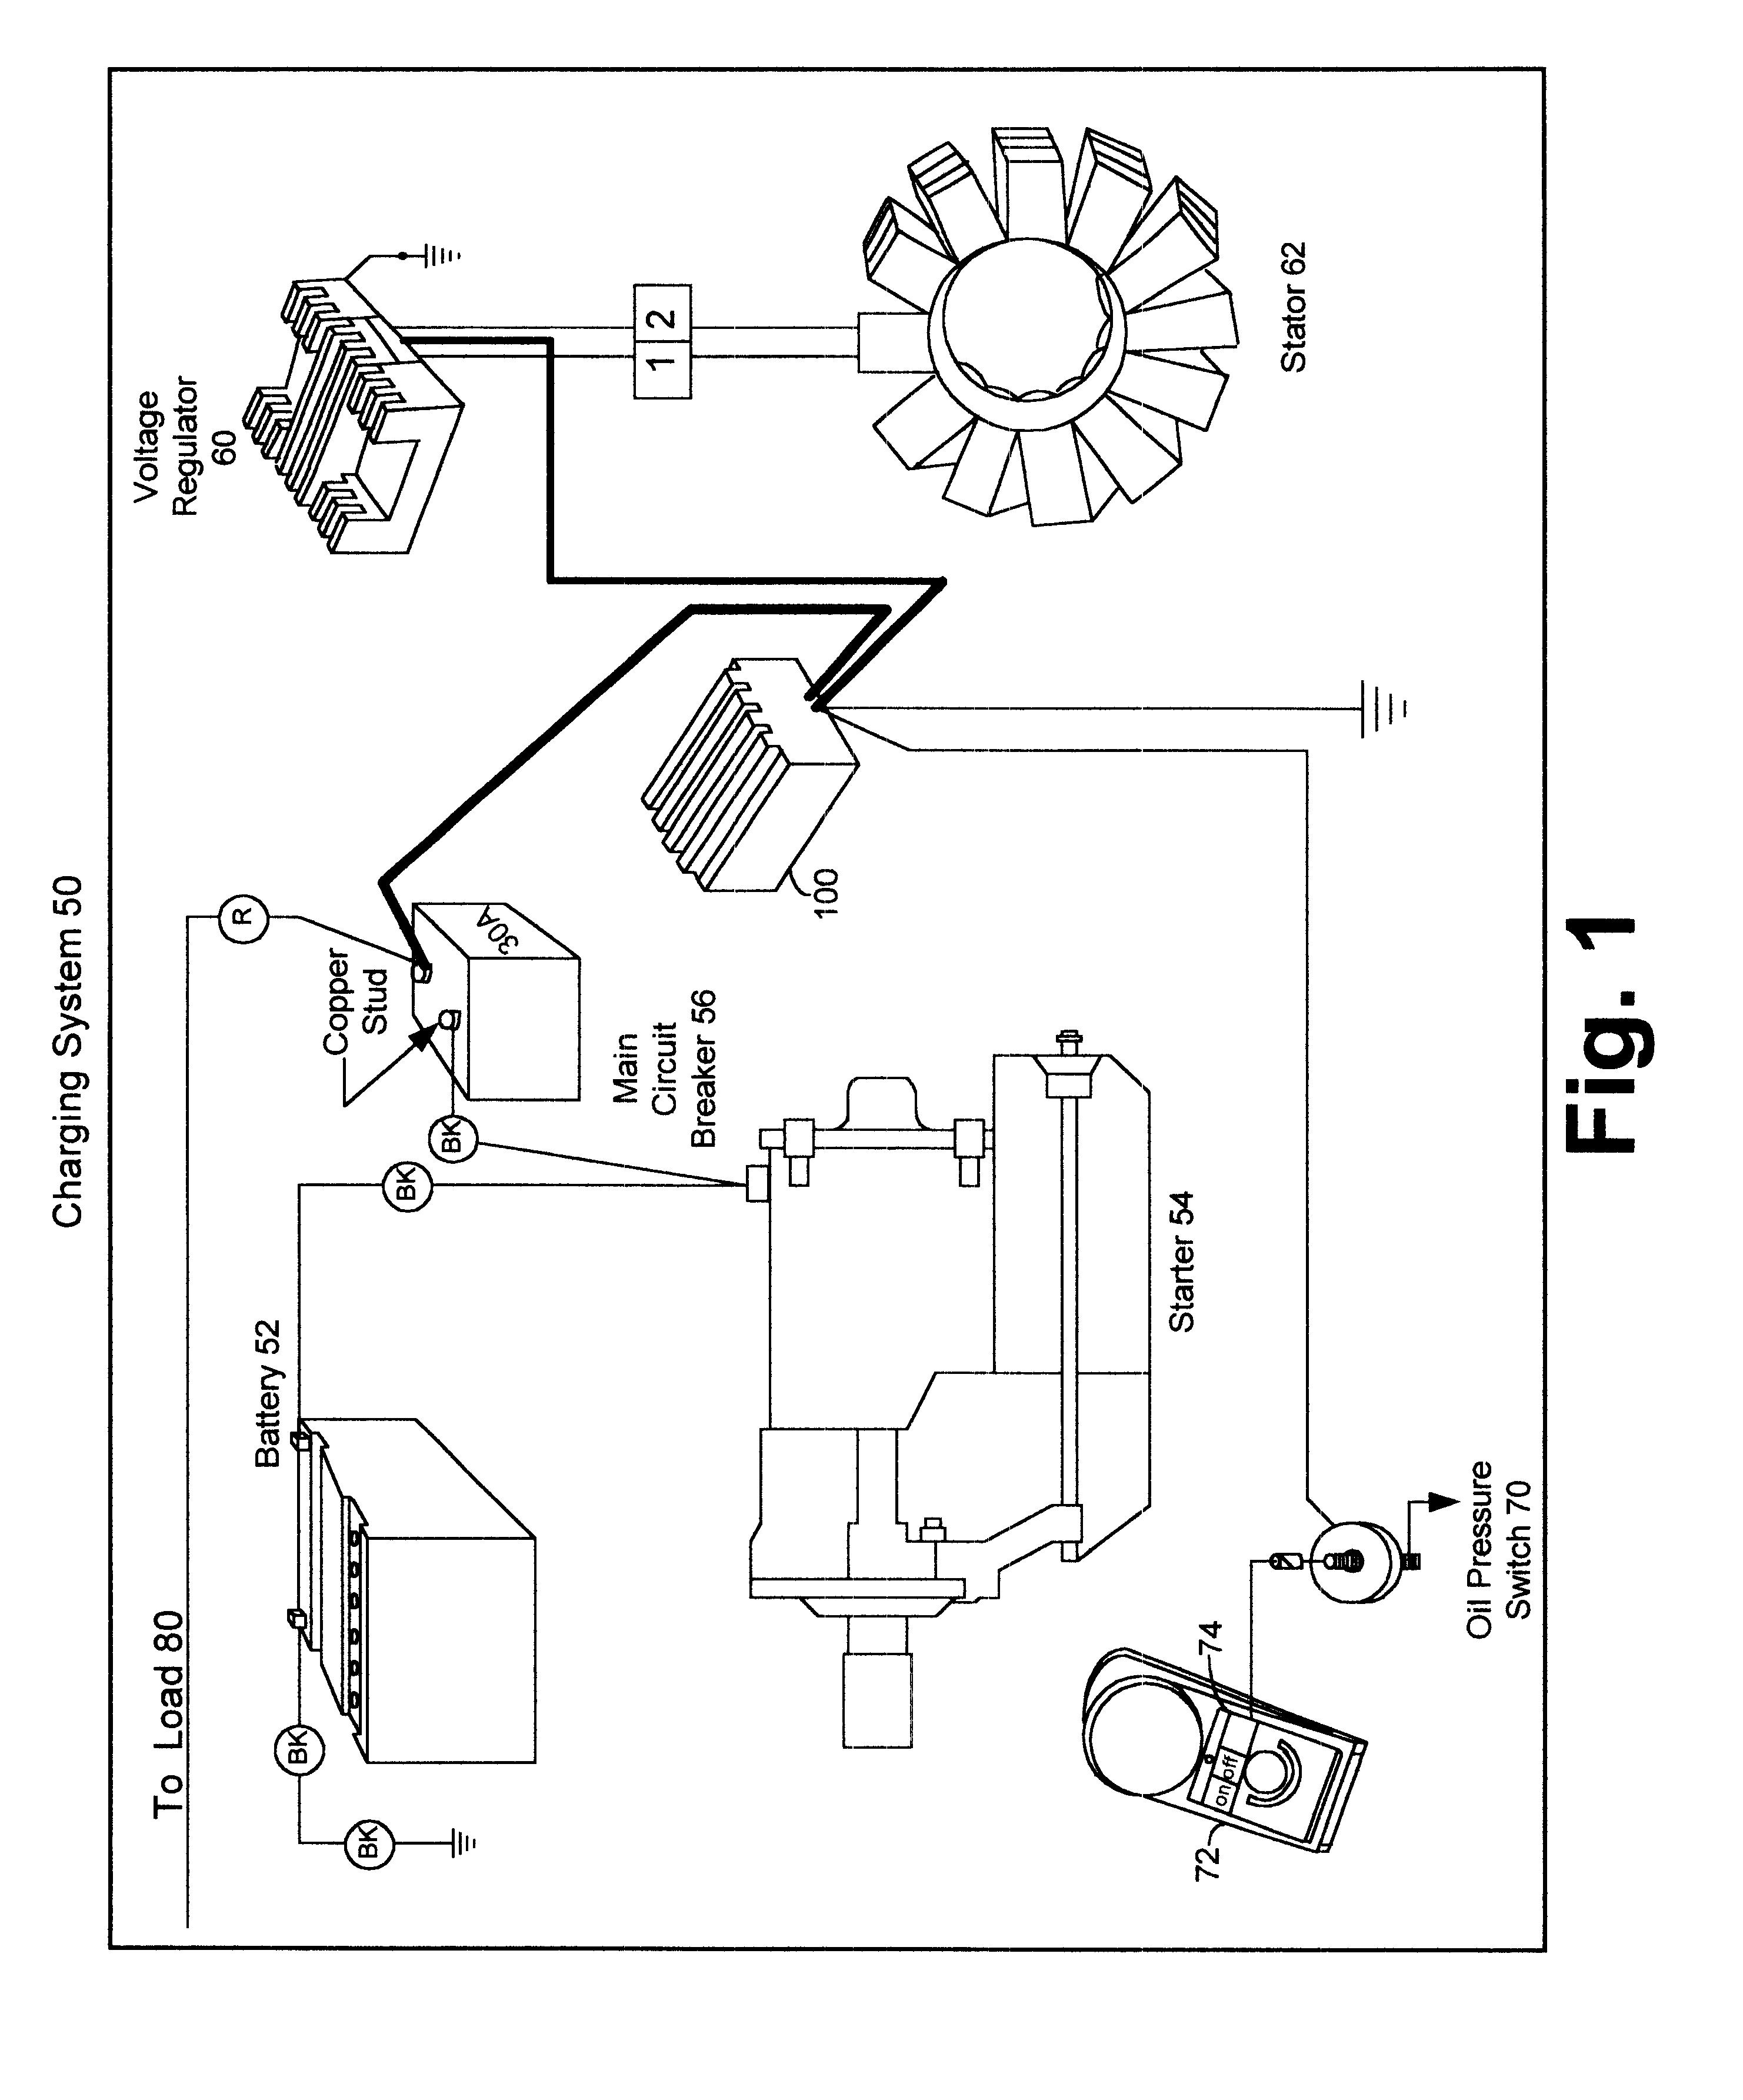 Harley davidson wiring diagram manual charger on harley davidson touring wiring diagram